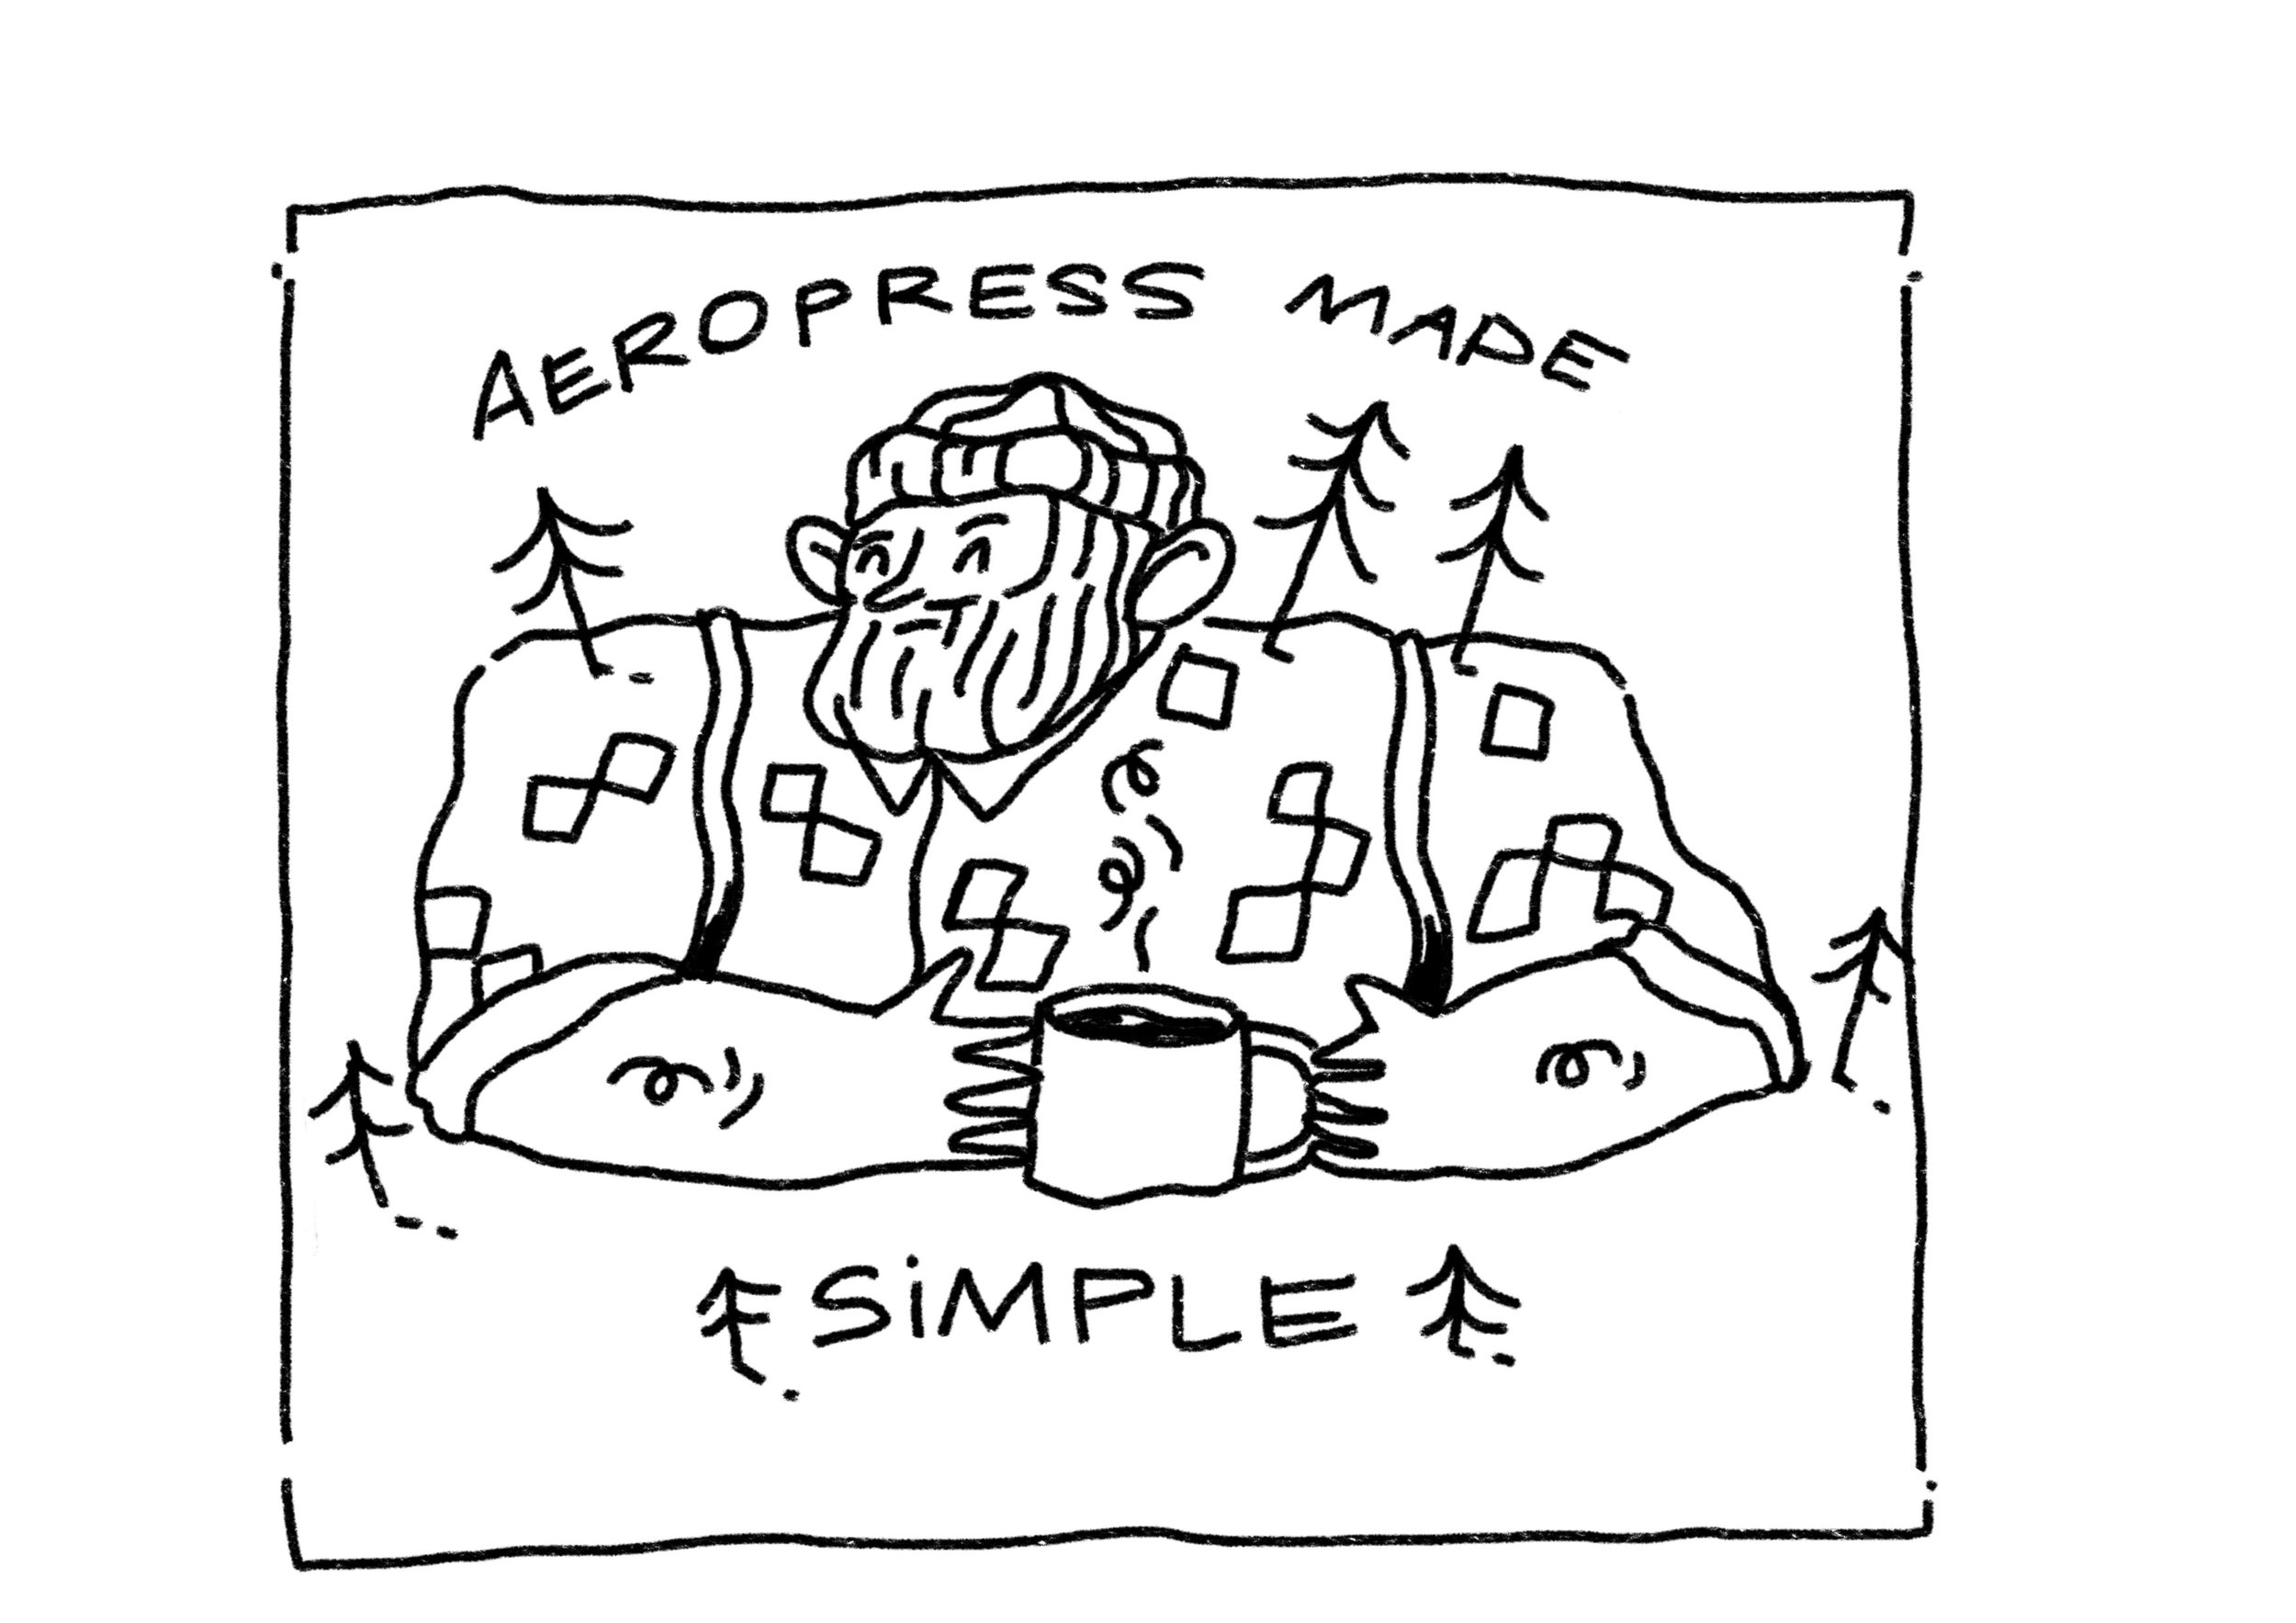 aeropress1.jpg